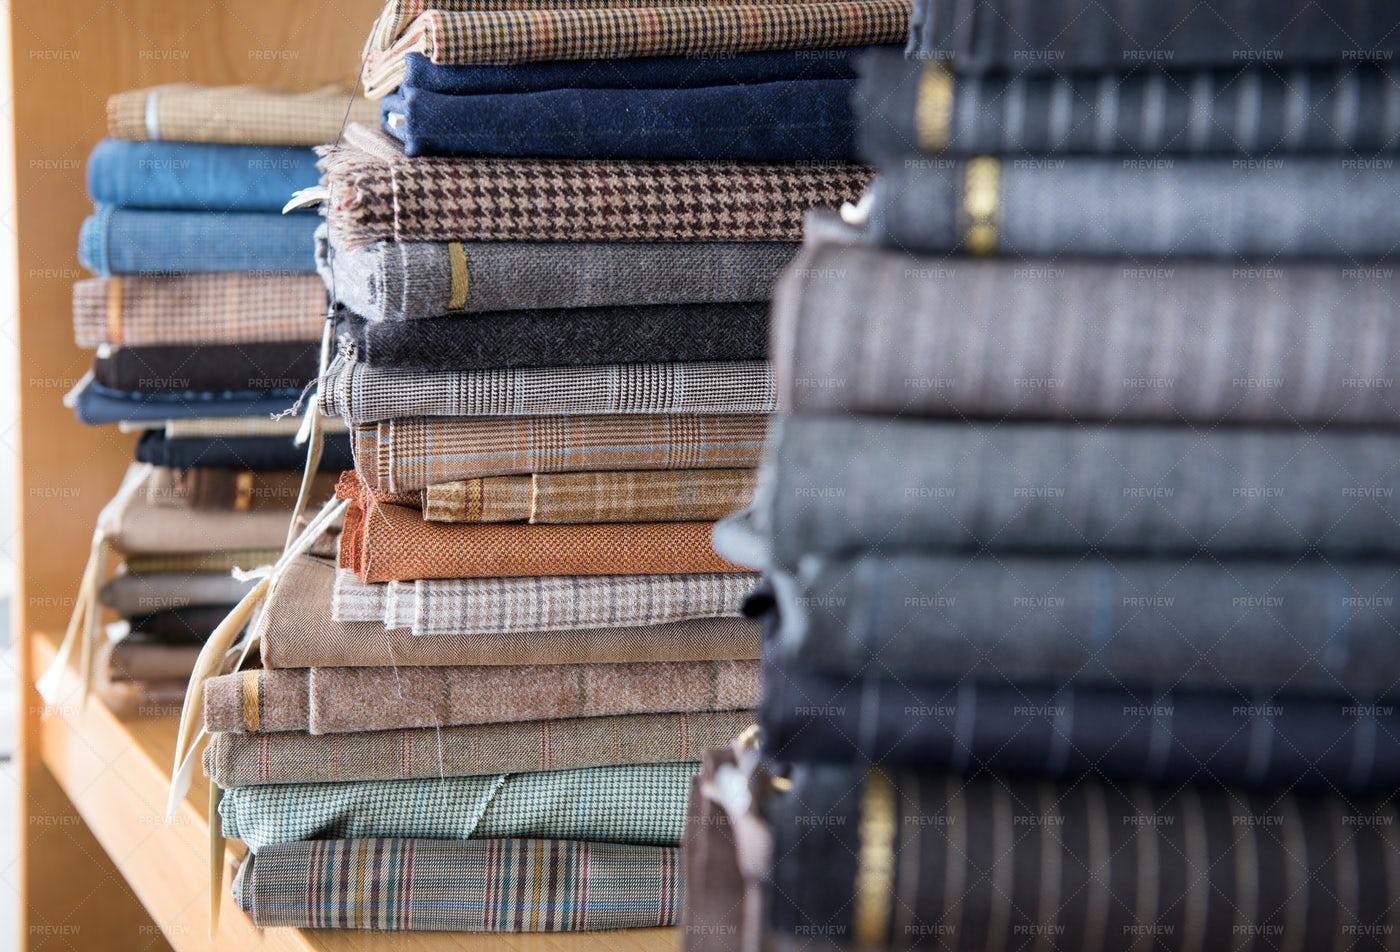 Stacks Of Fabrics On A Shelf: Stock Photos